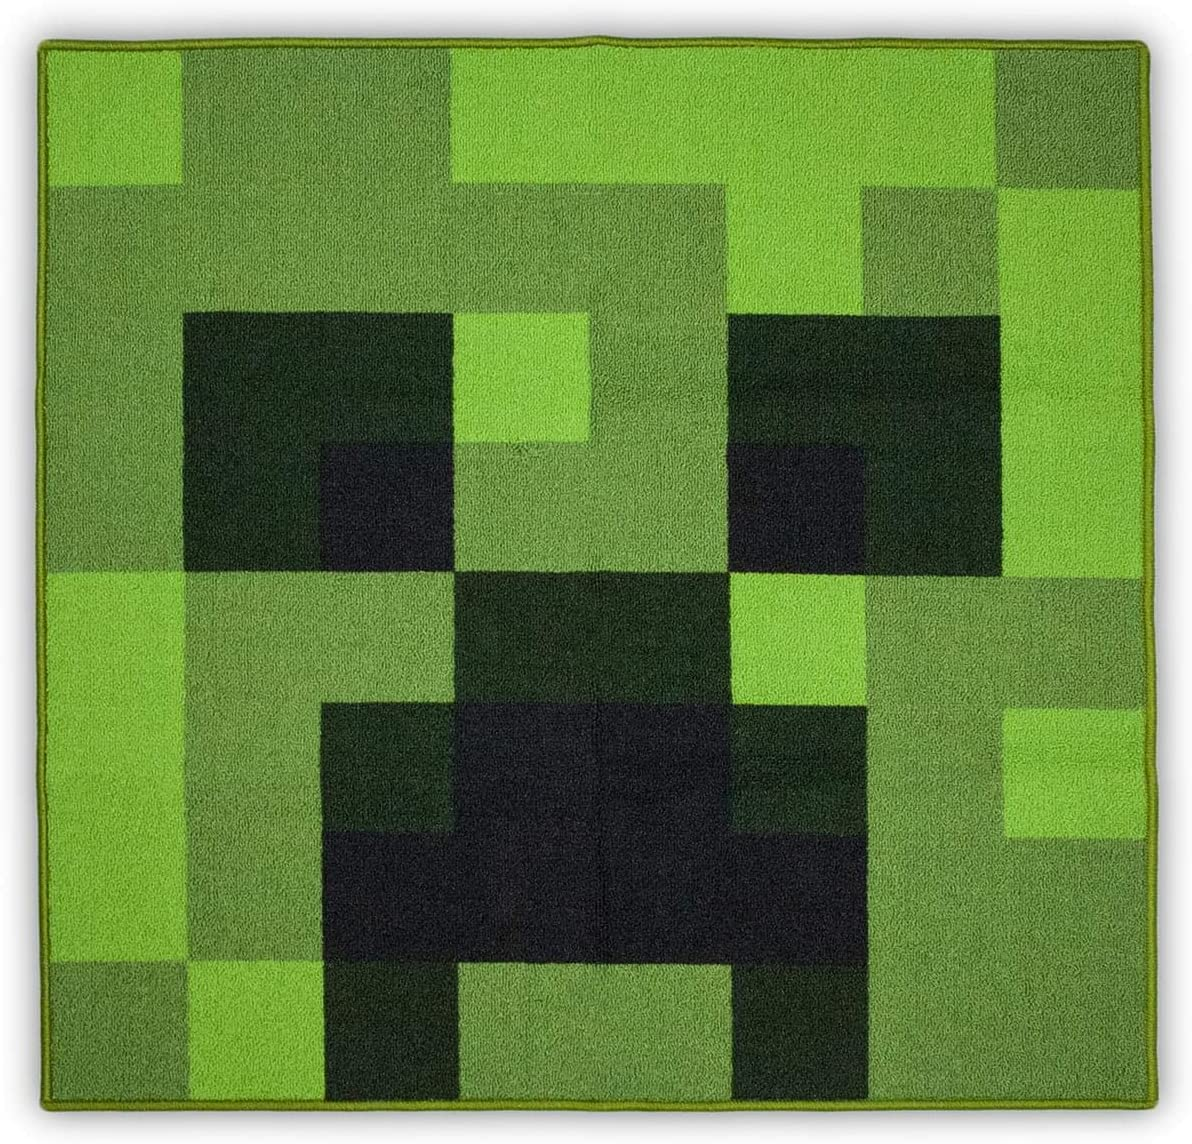 Minecraft Area Rug | Creeper Minecraft Decorations | Minecraft Rug Features Creeper from Minecraft | Minecraft Creeper Face Decorations | 39-Inch Square Area Rug